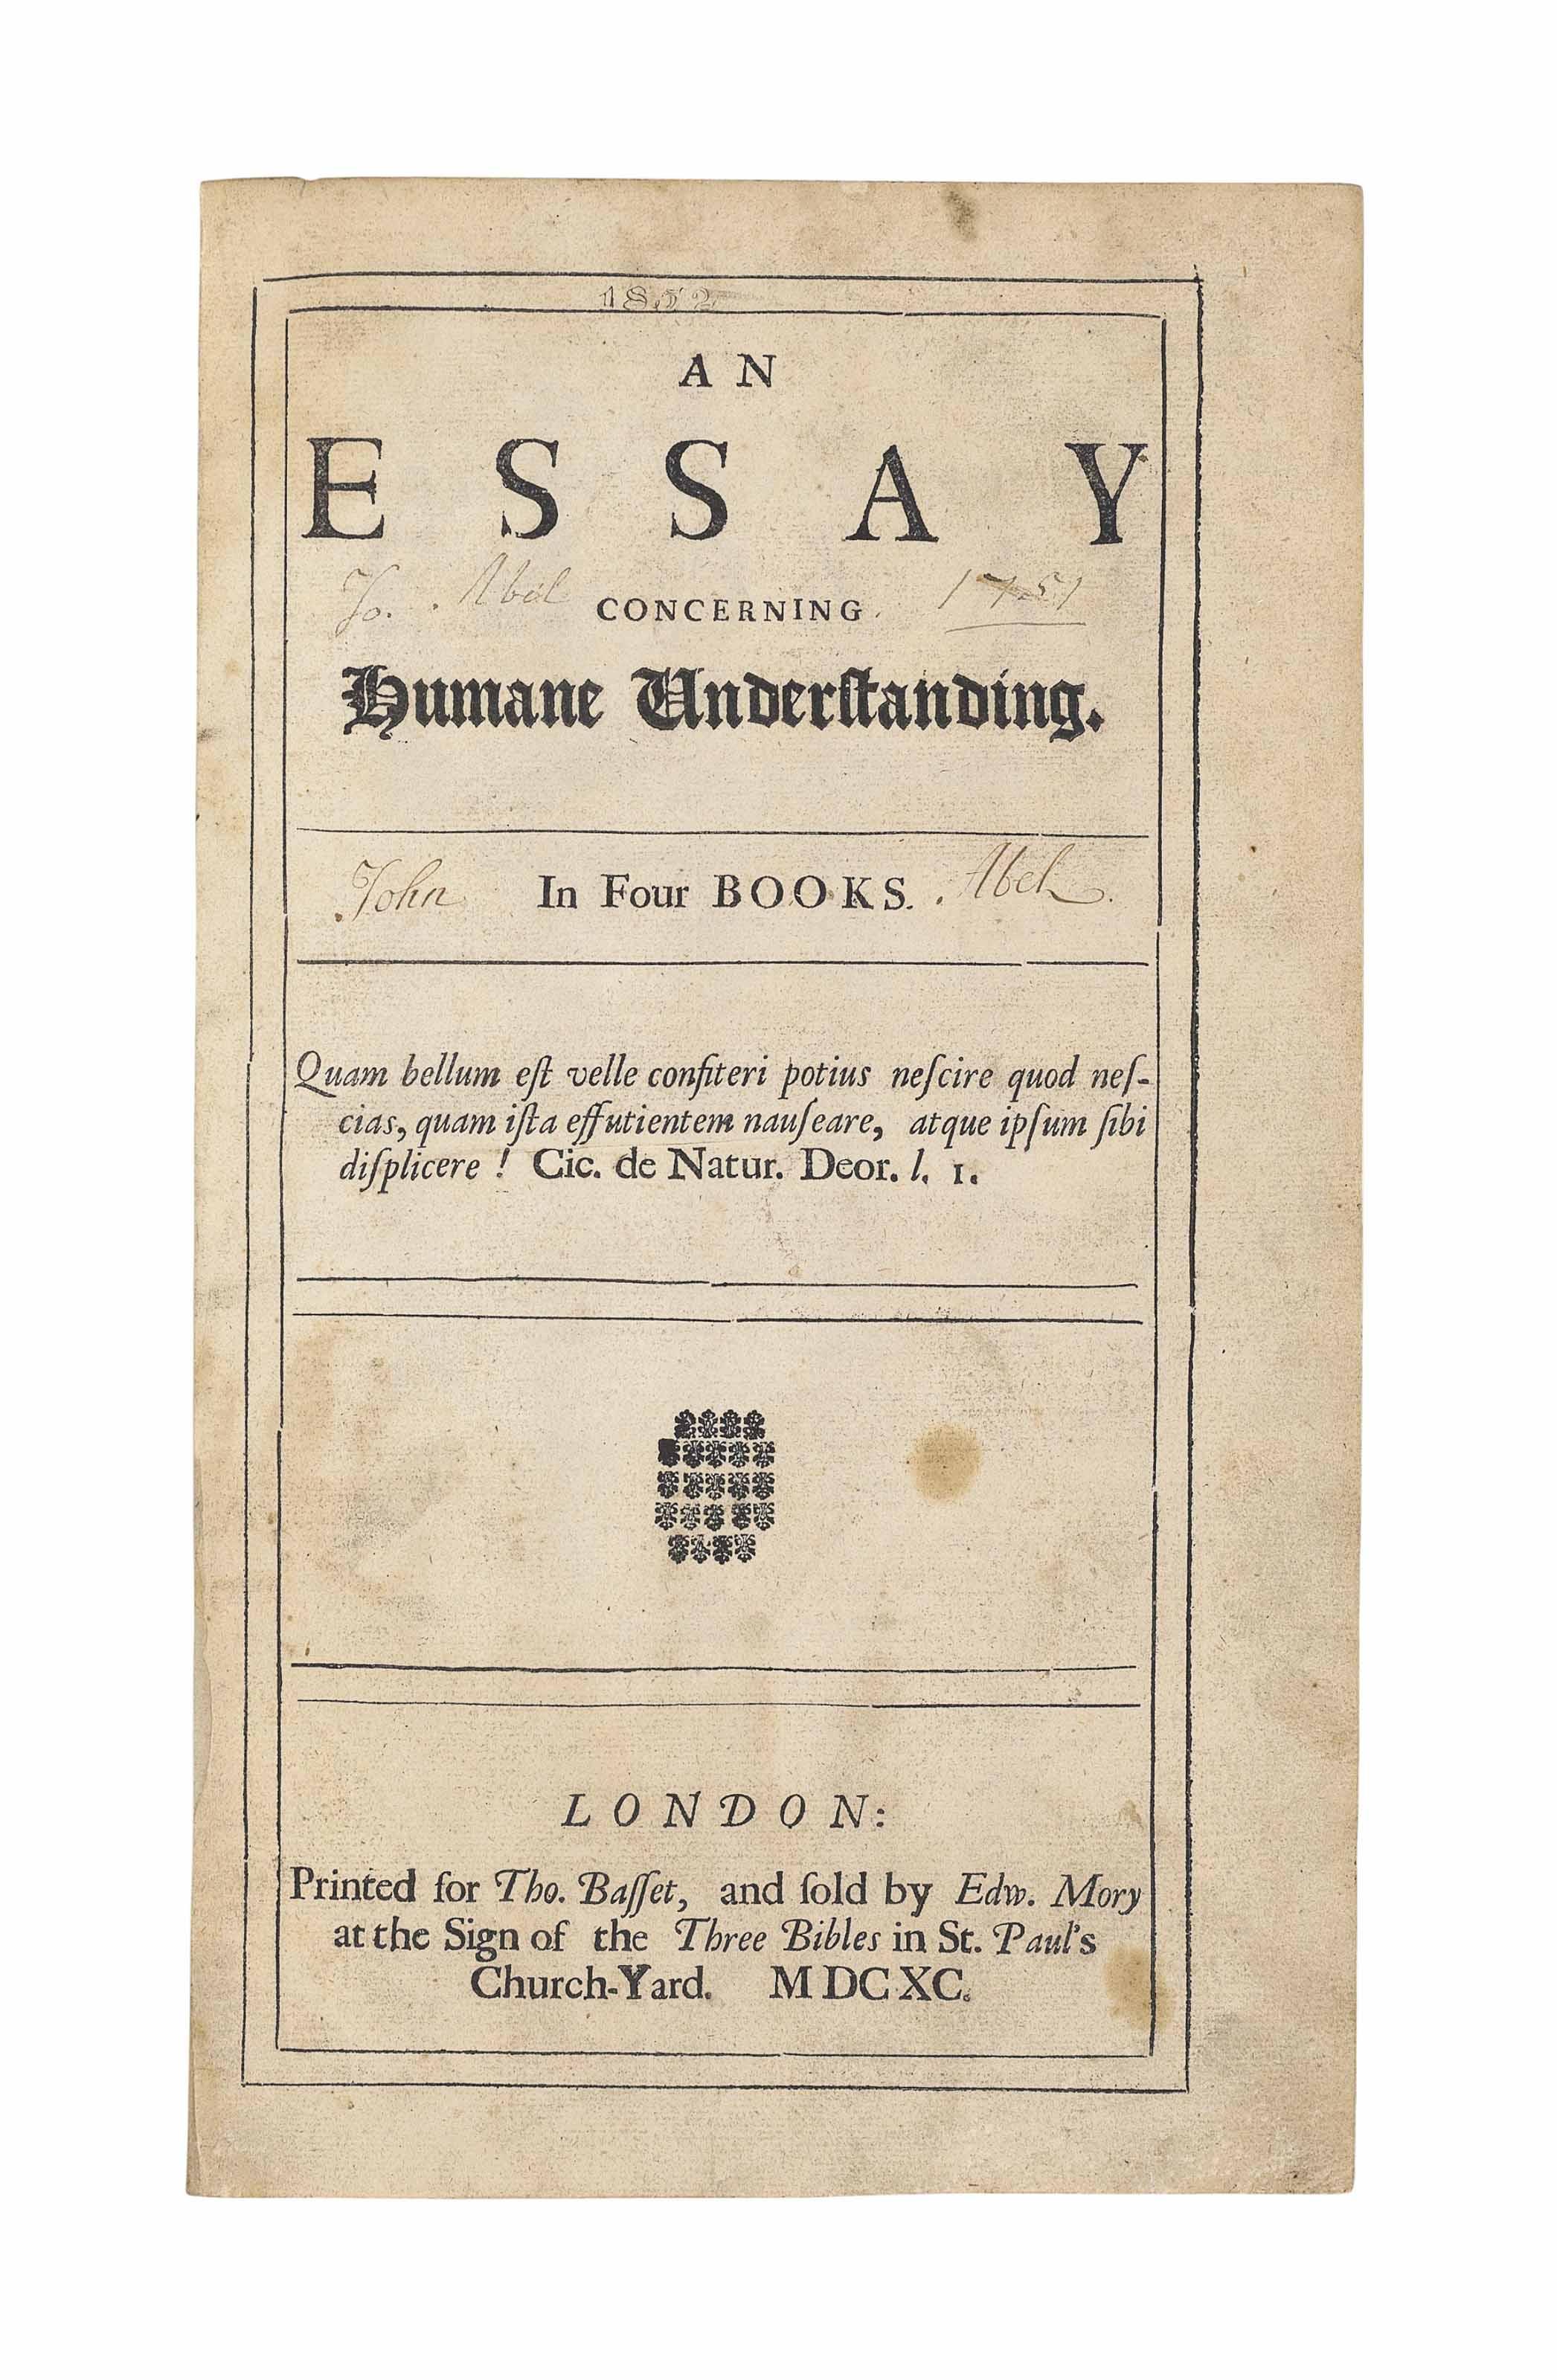 [LOCKE, John (1632-1704).] An Essay concerning Humane Understanding. London: [Elizabeth Holt] for Thomas Basset, and sold by Edward Mory, 1690.